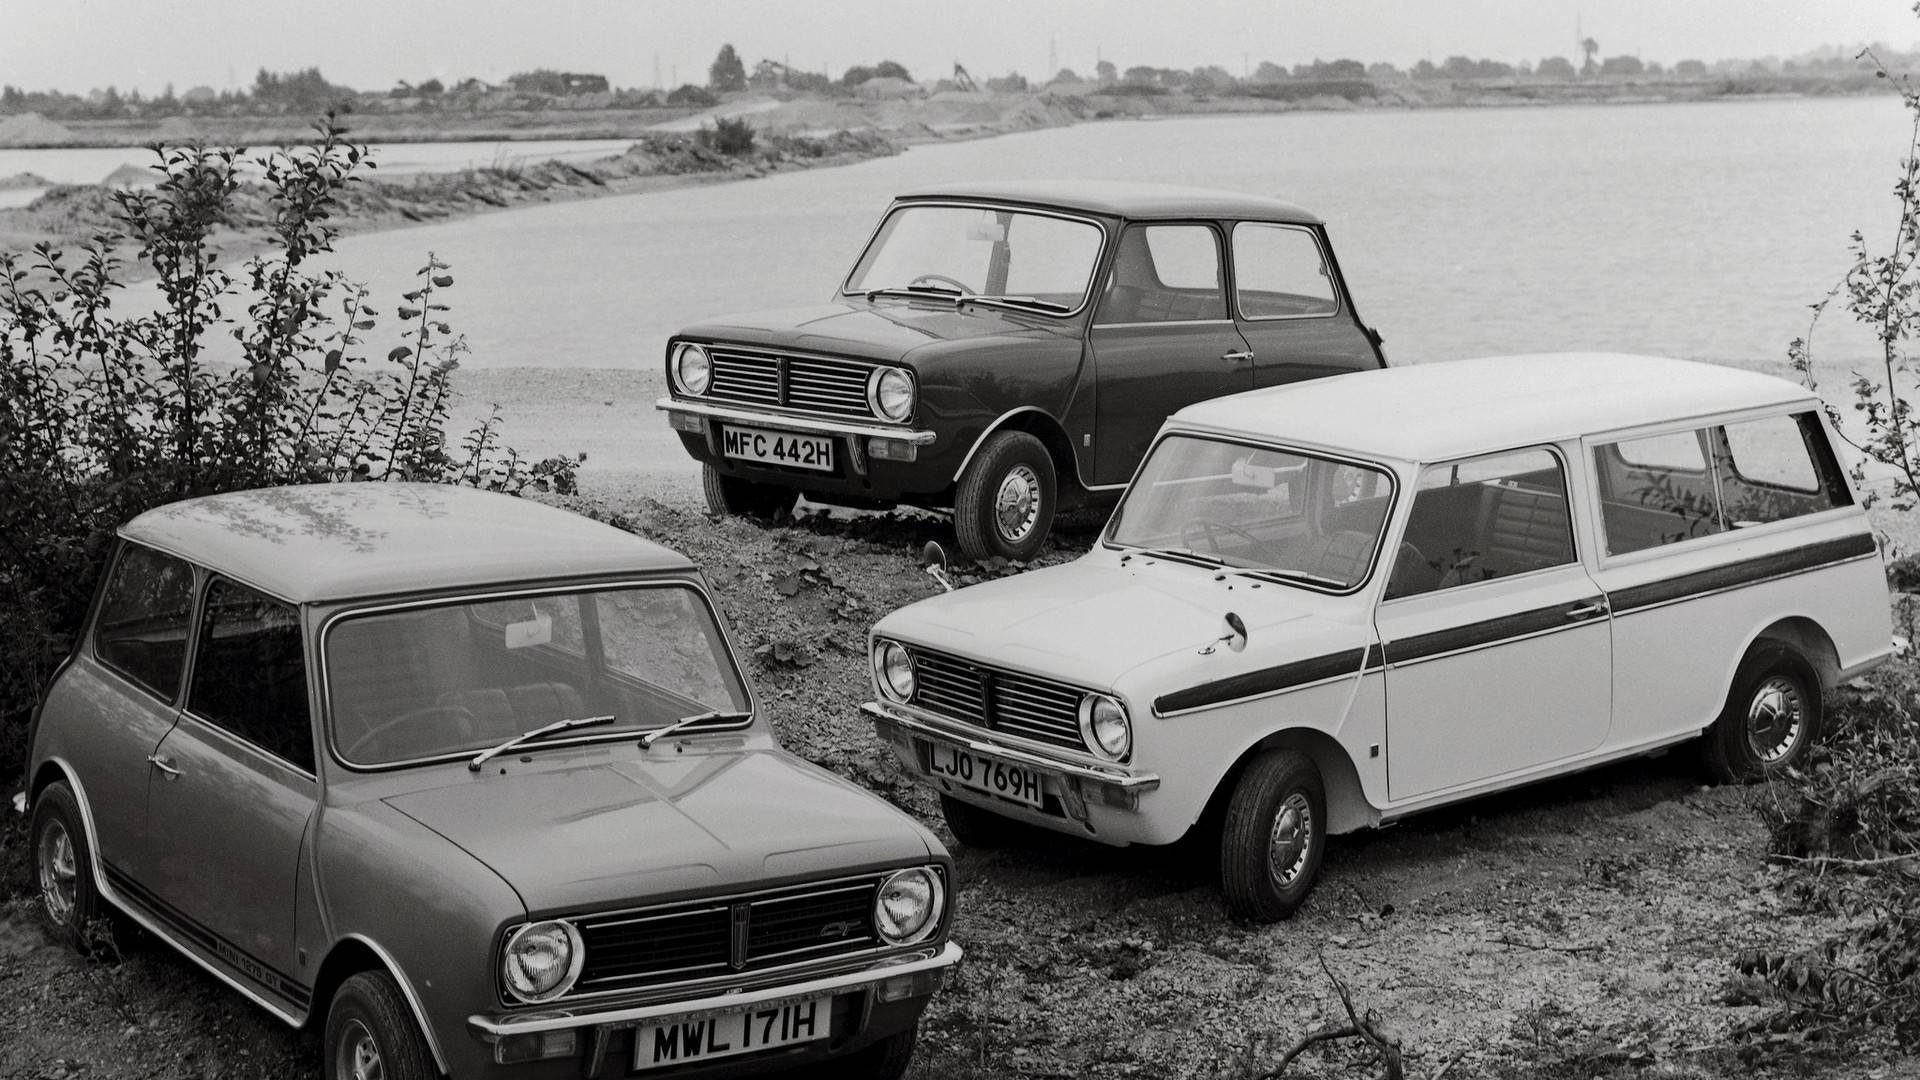 5a9414a9b7ad9 classic mini through the years چرا ما کلاسیک مینی را دوست داریم   اجاره ماشین